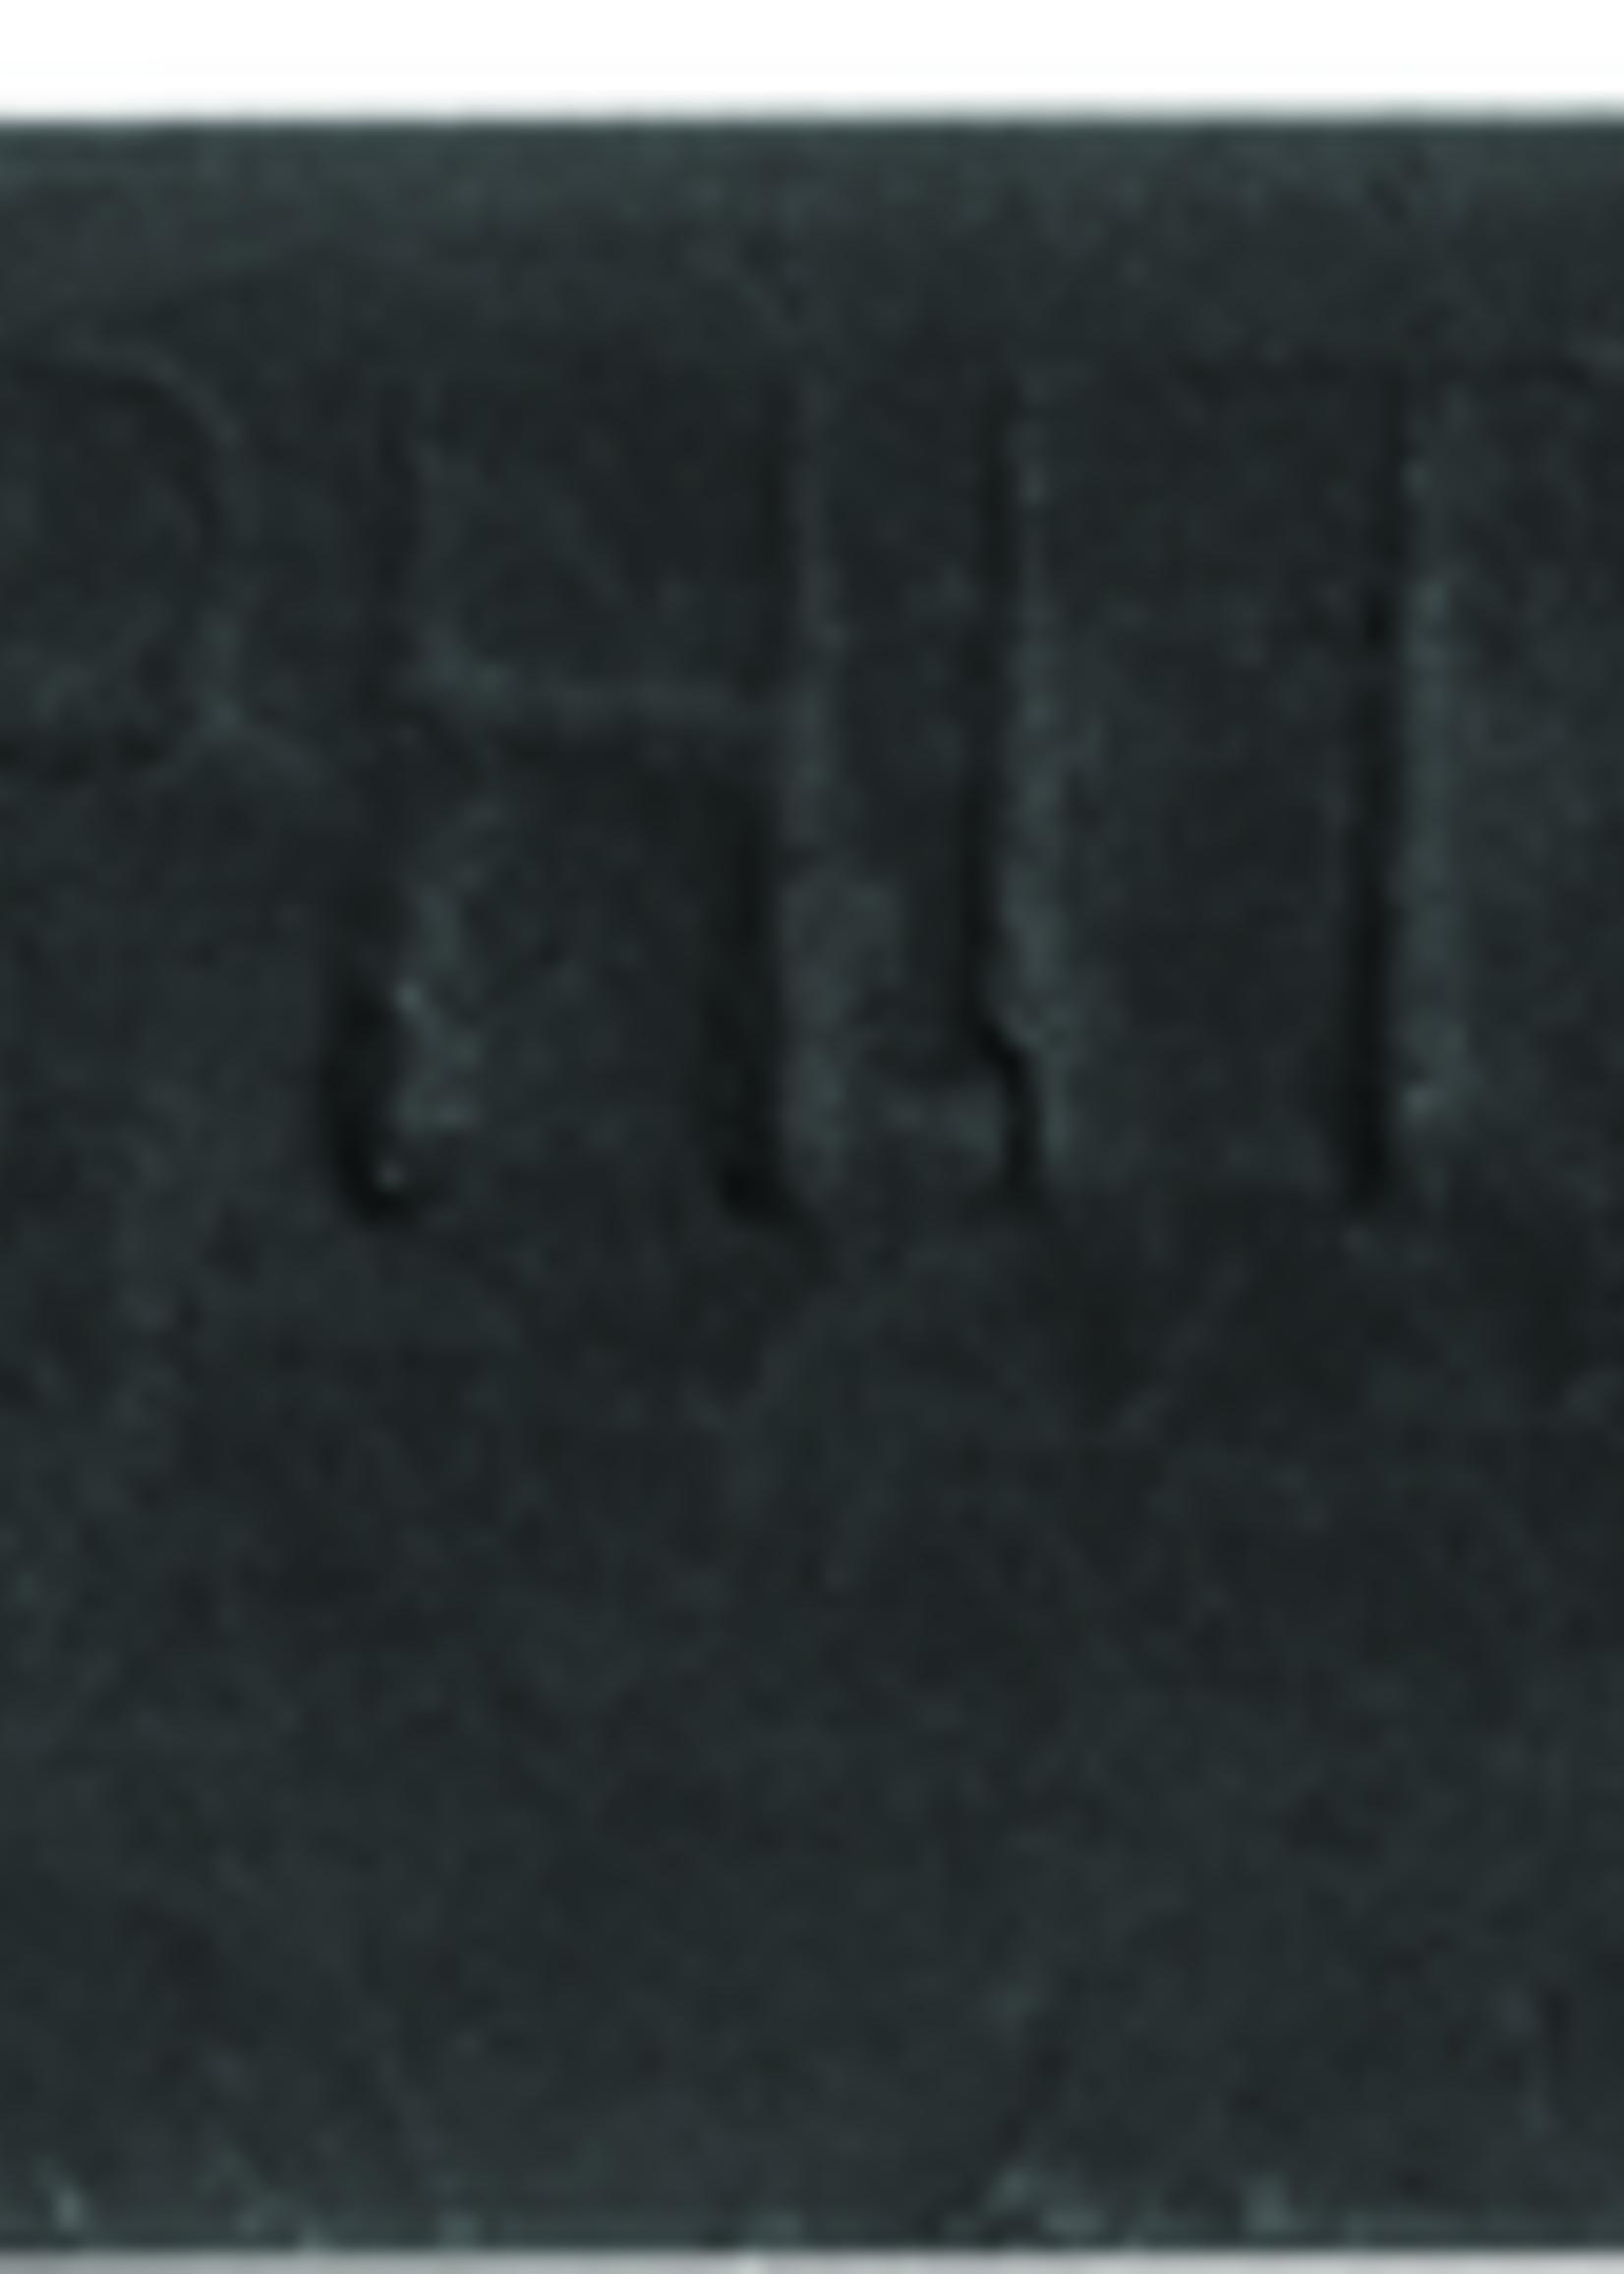 GENERAL PENCIL CO., INC. KIMBERLY GRAPHITE STICKS